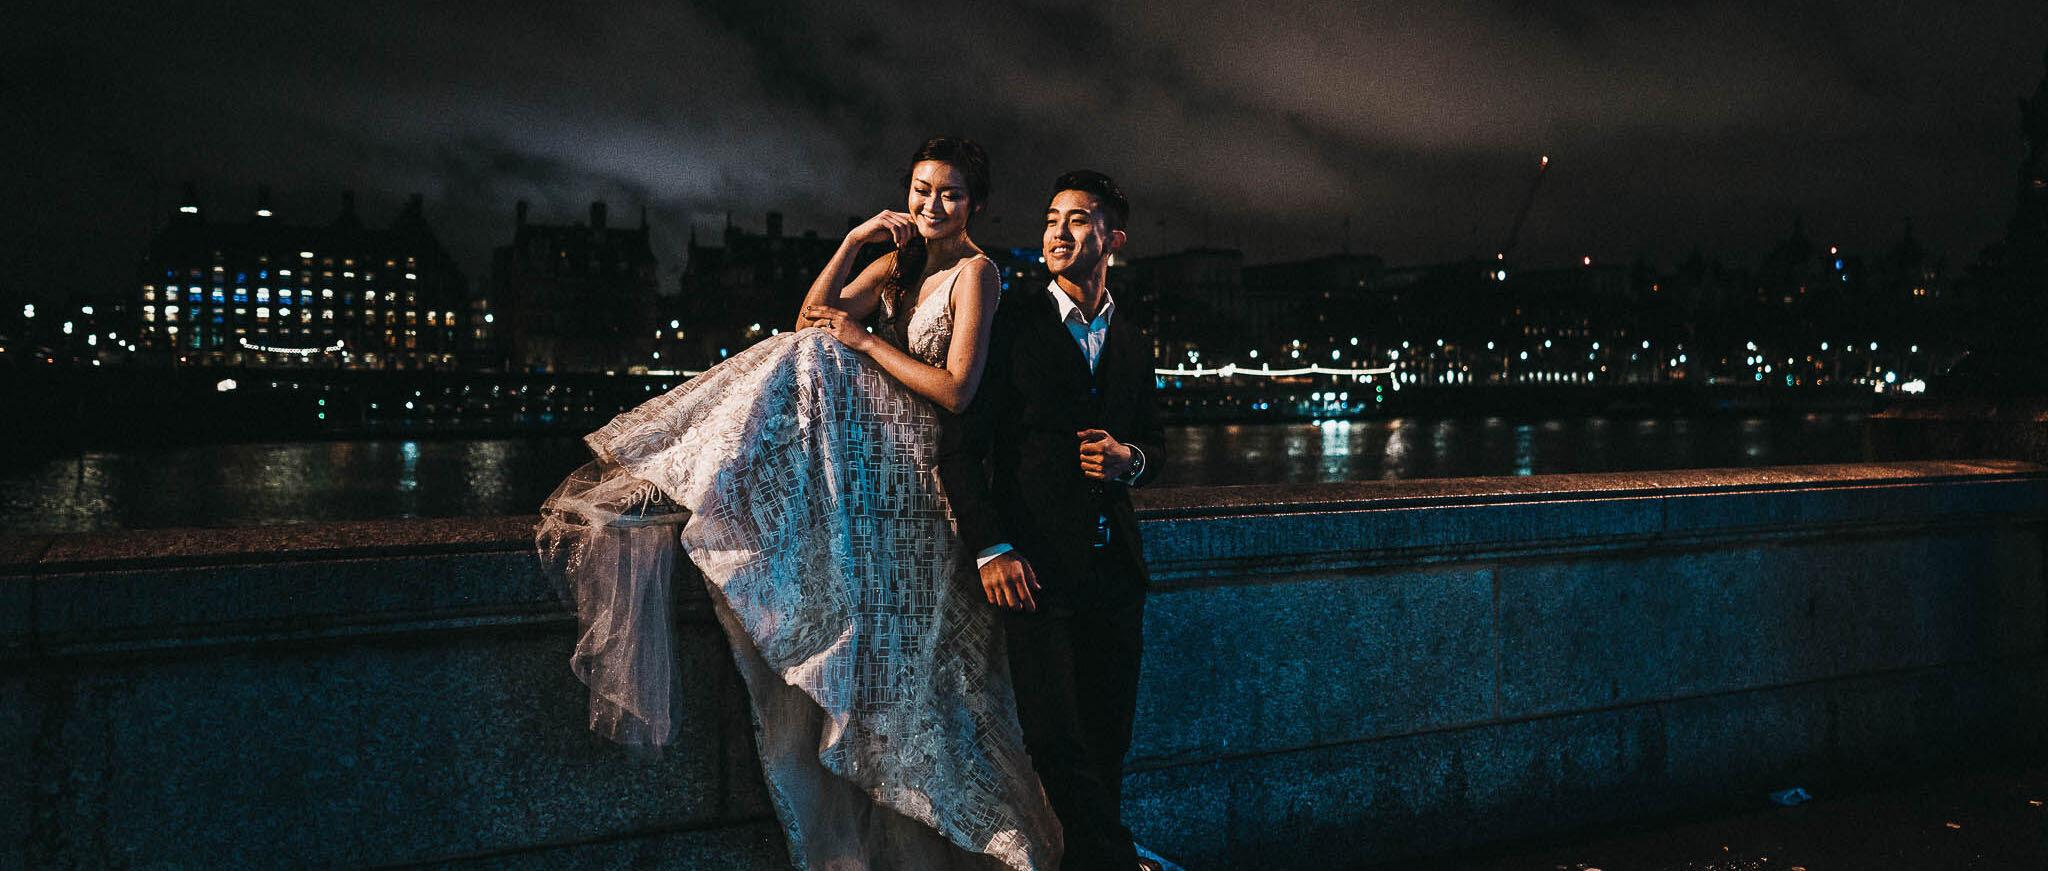 London-Couples-Shoot-13.jpg